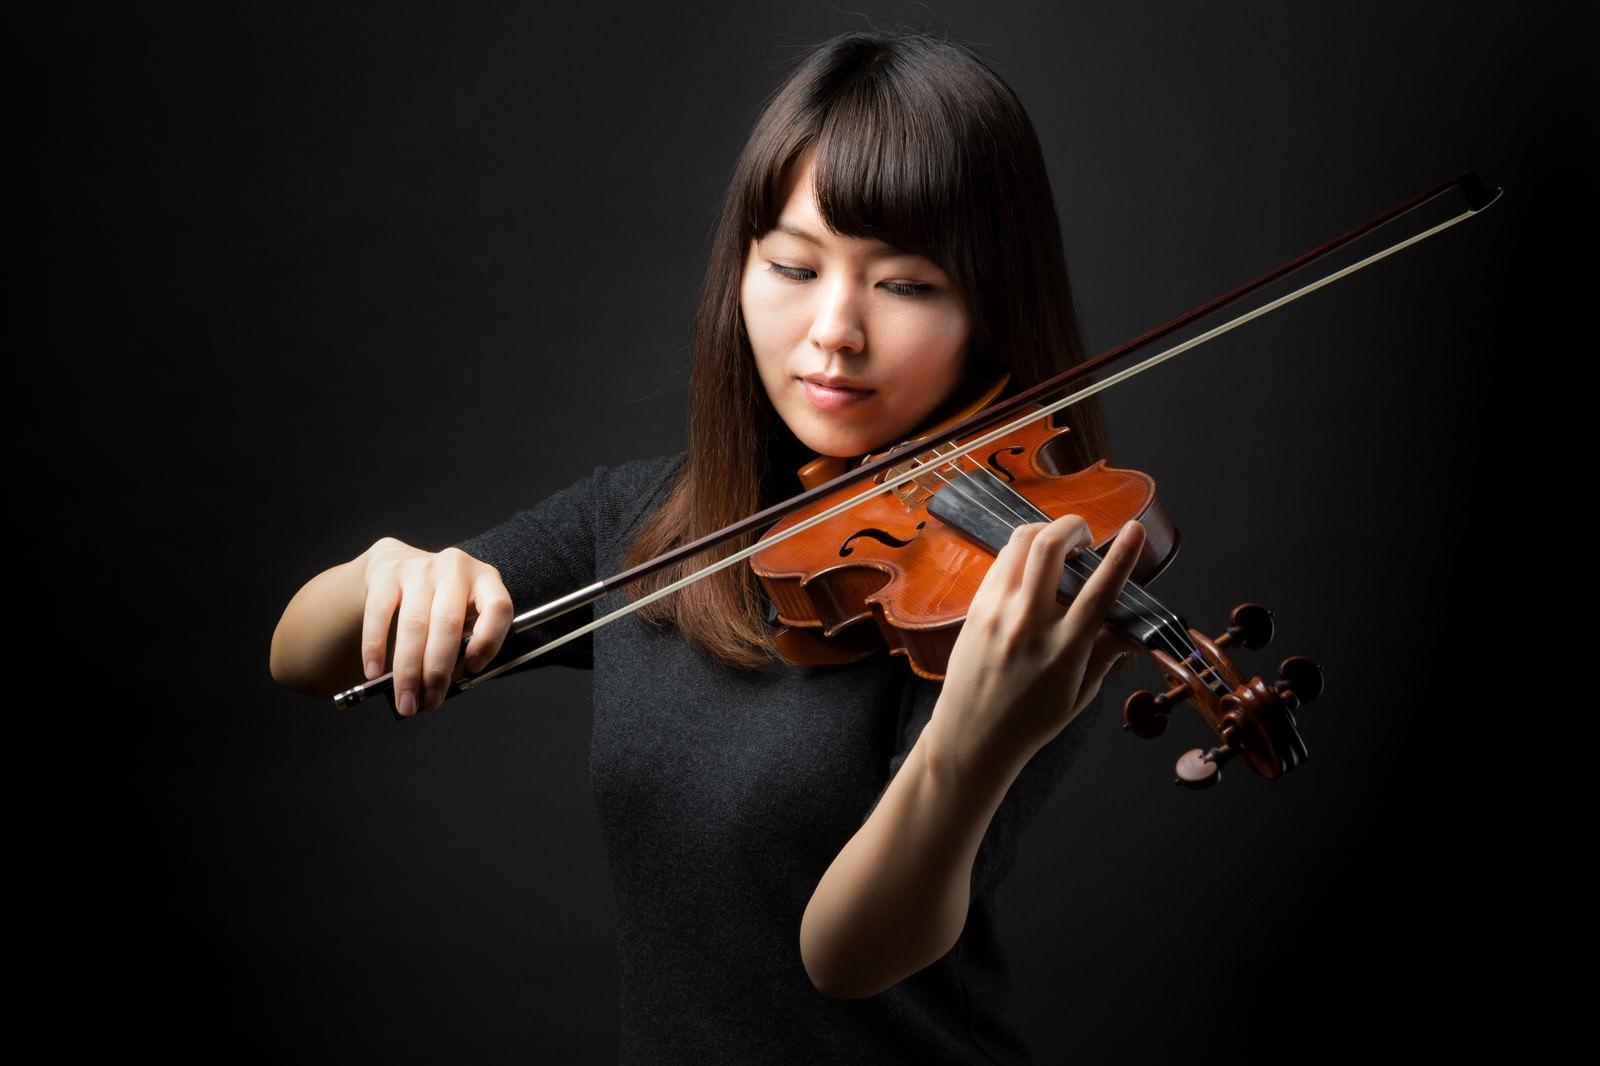 ヴァイオリン演奏中の女性